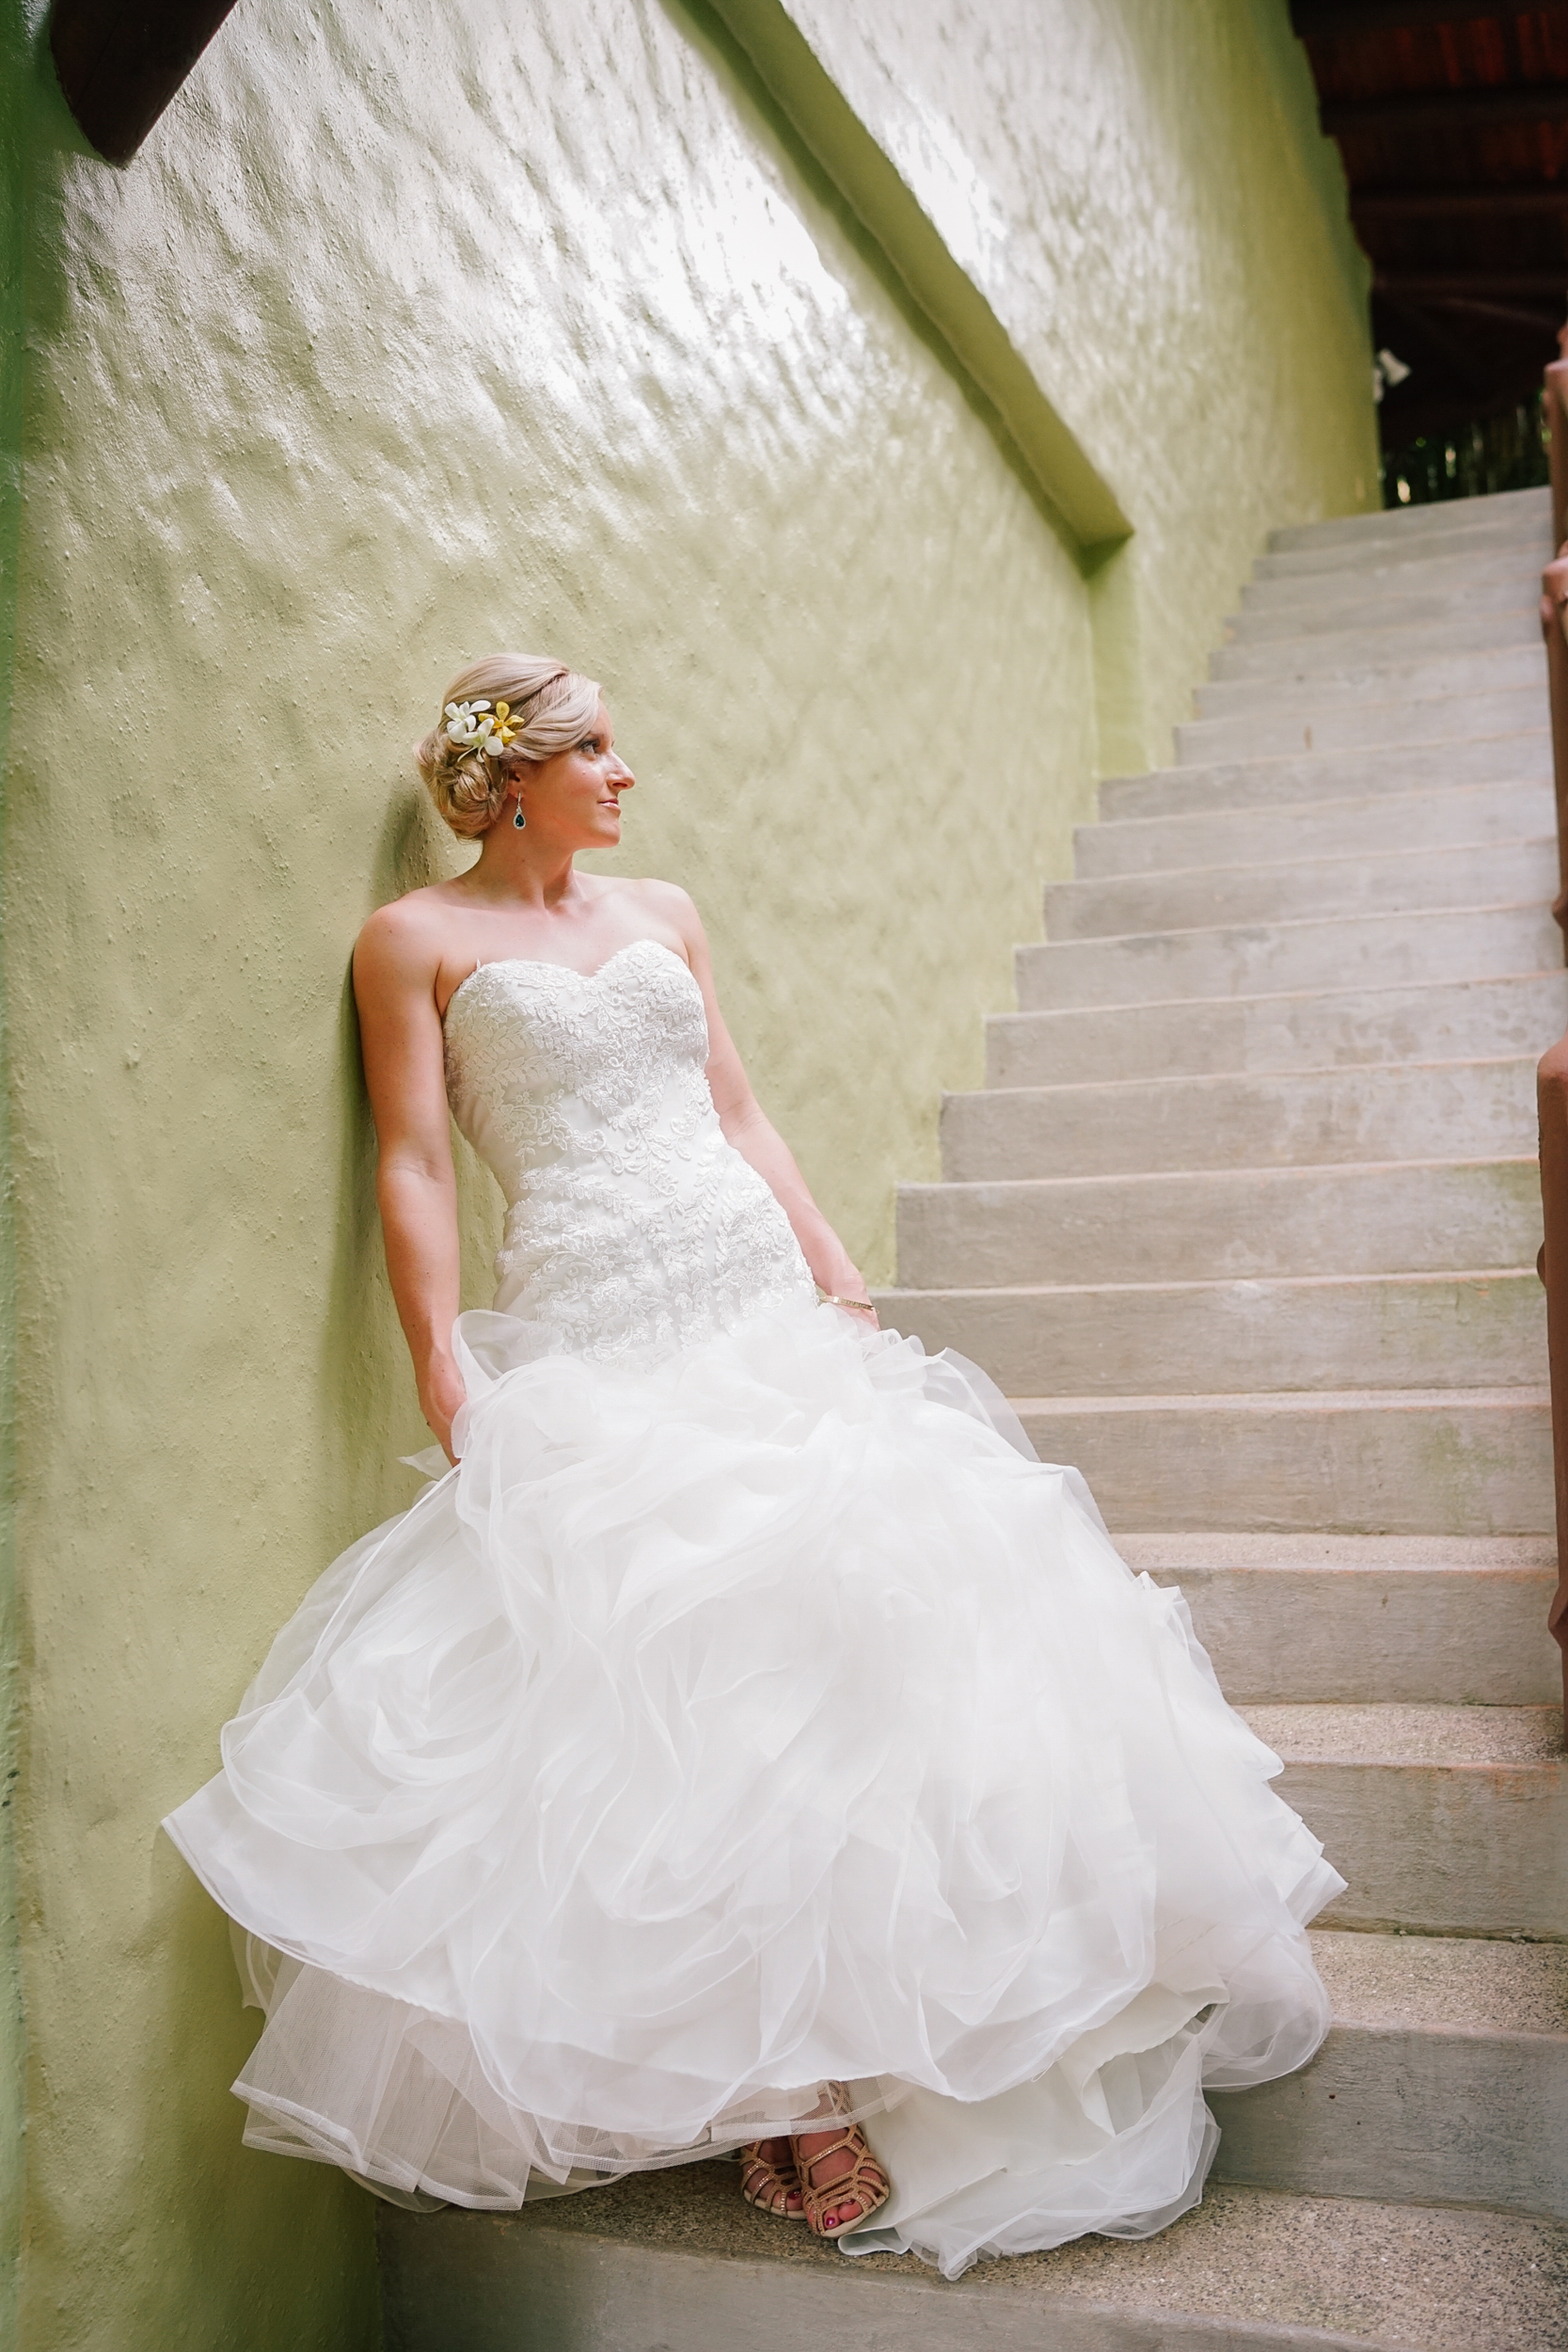 JKP-Destination-Weddings-0062.JPG